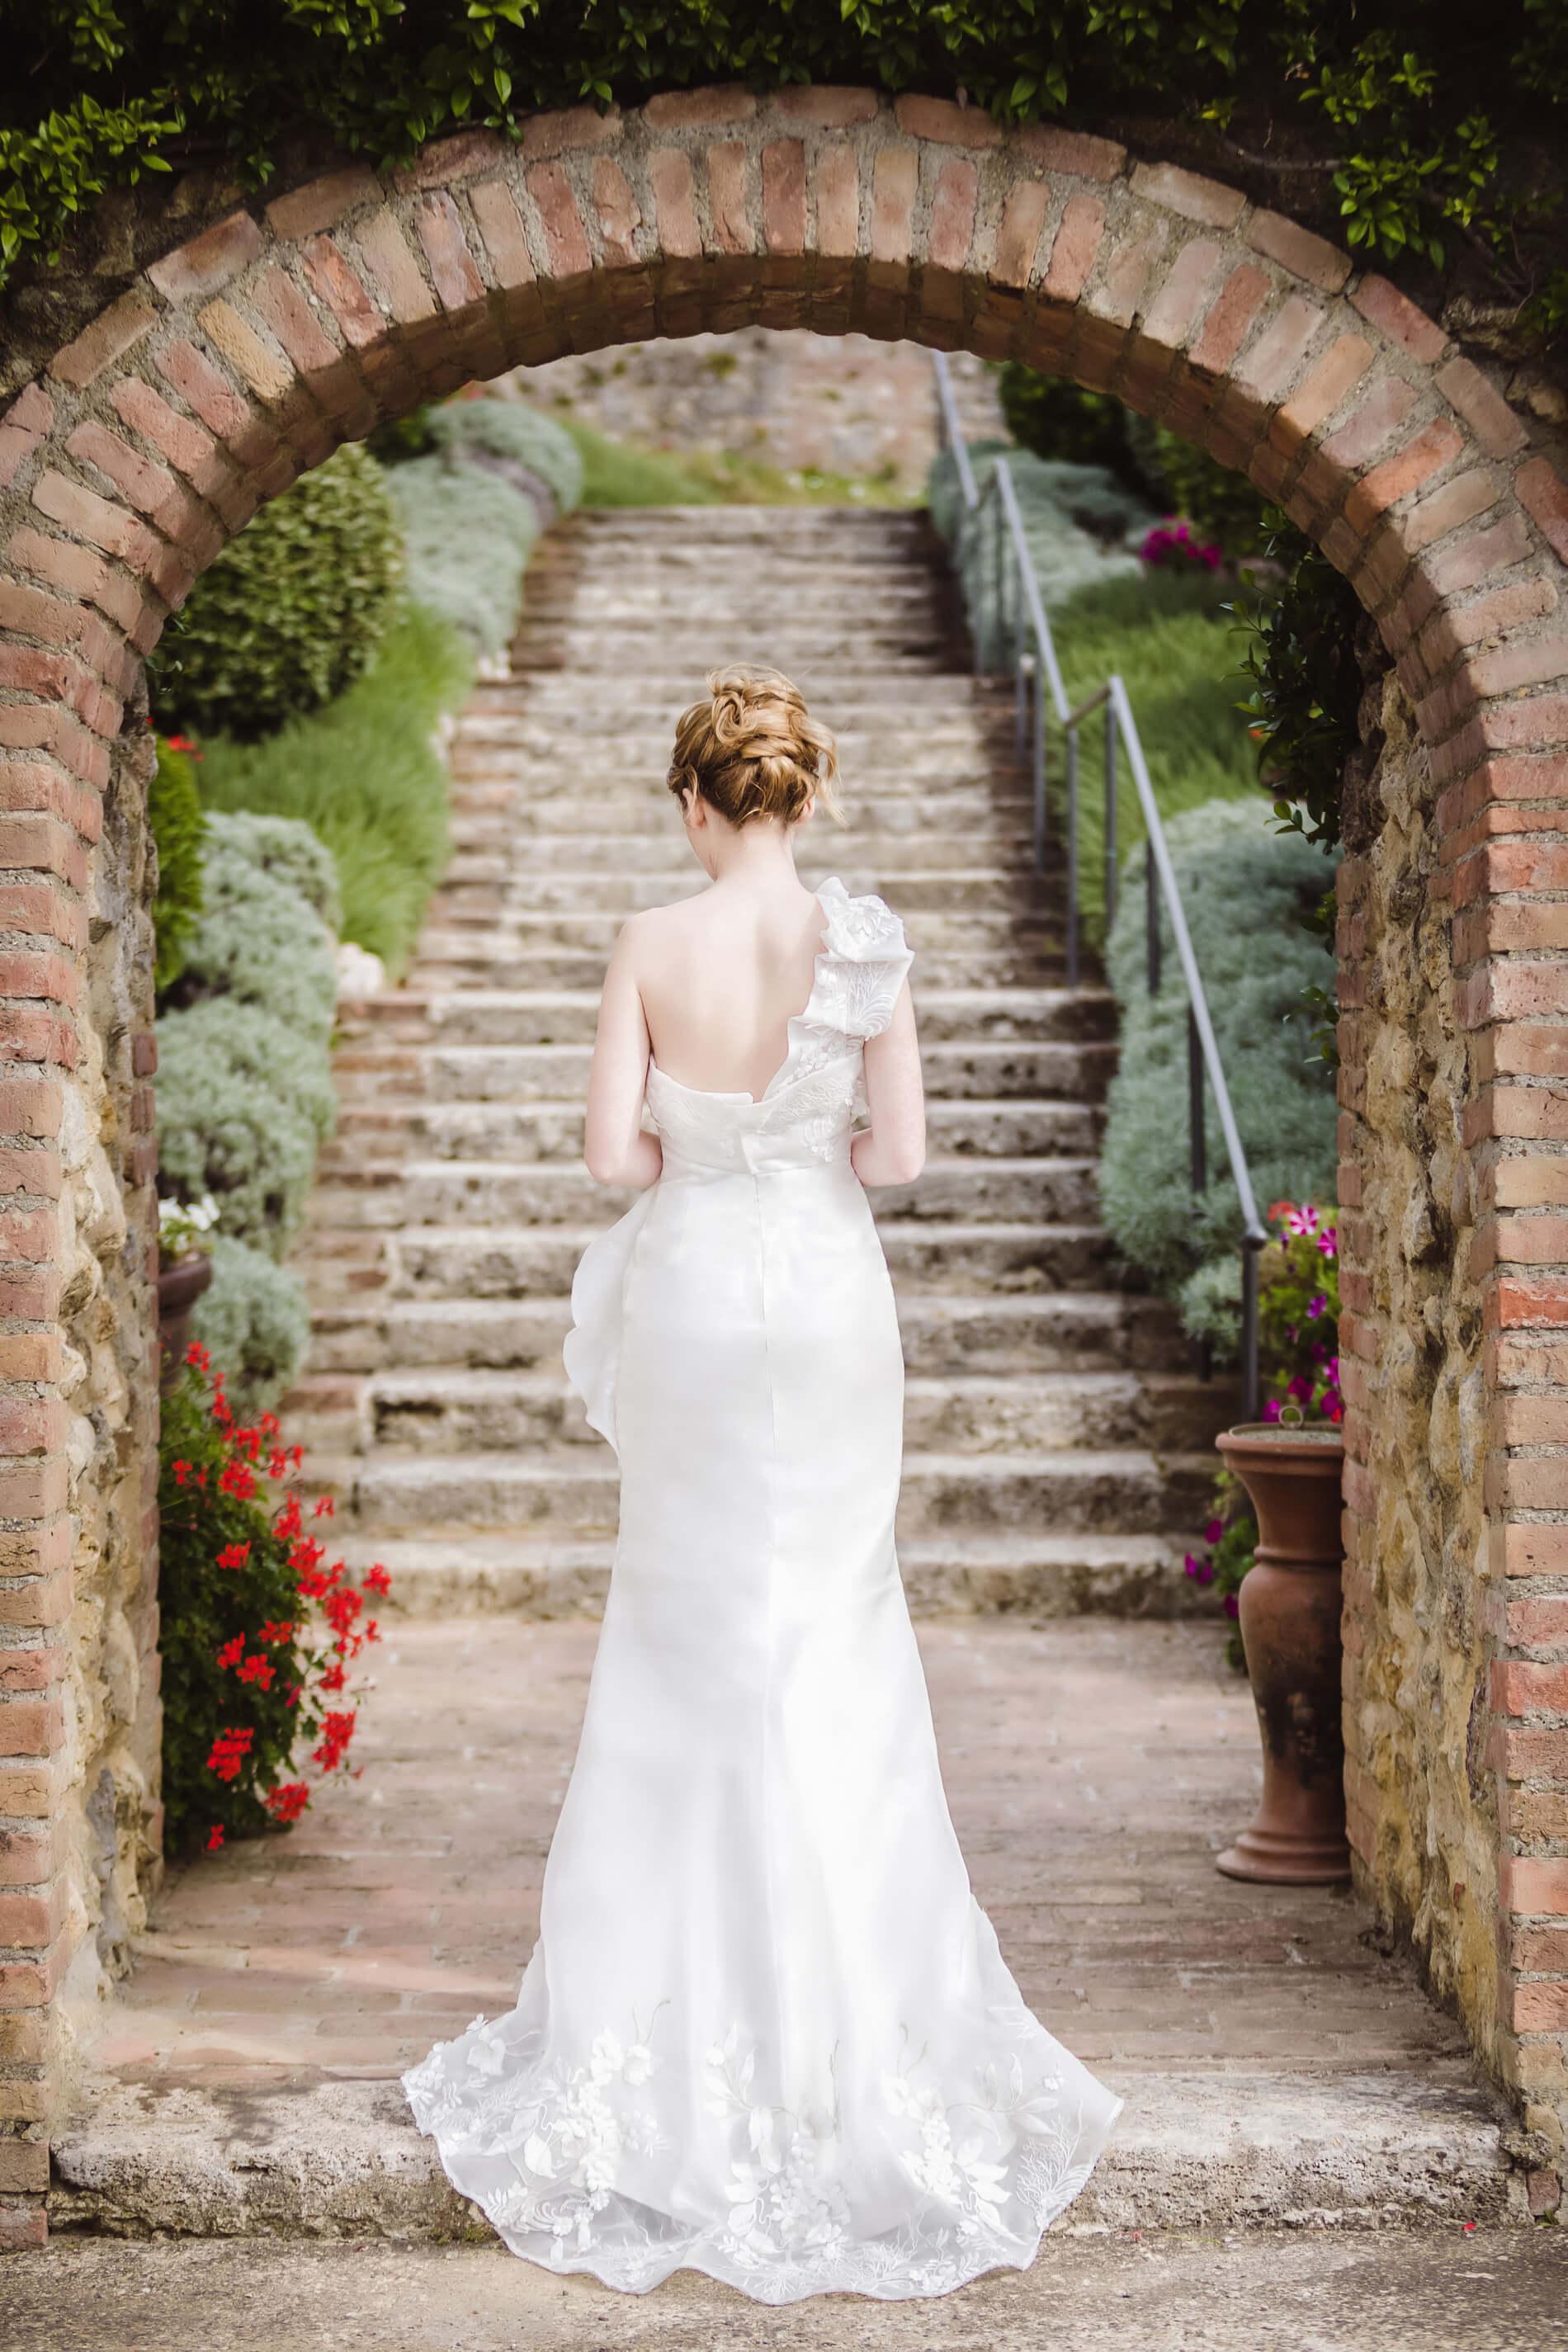 Oriana 3 - Zea Couture - Abiti da Sposa